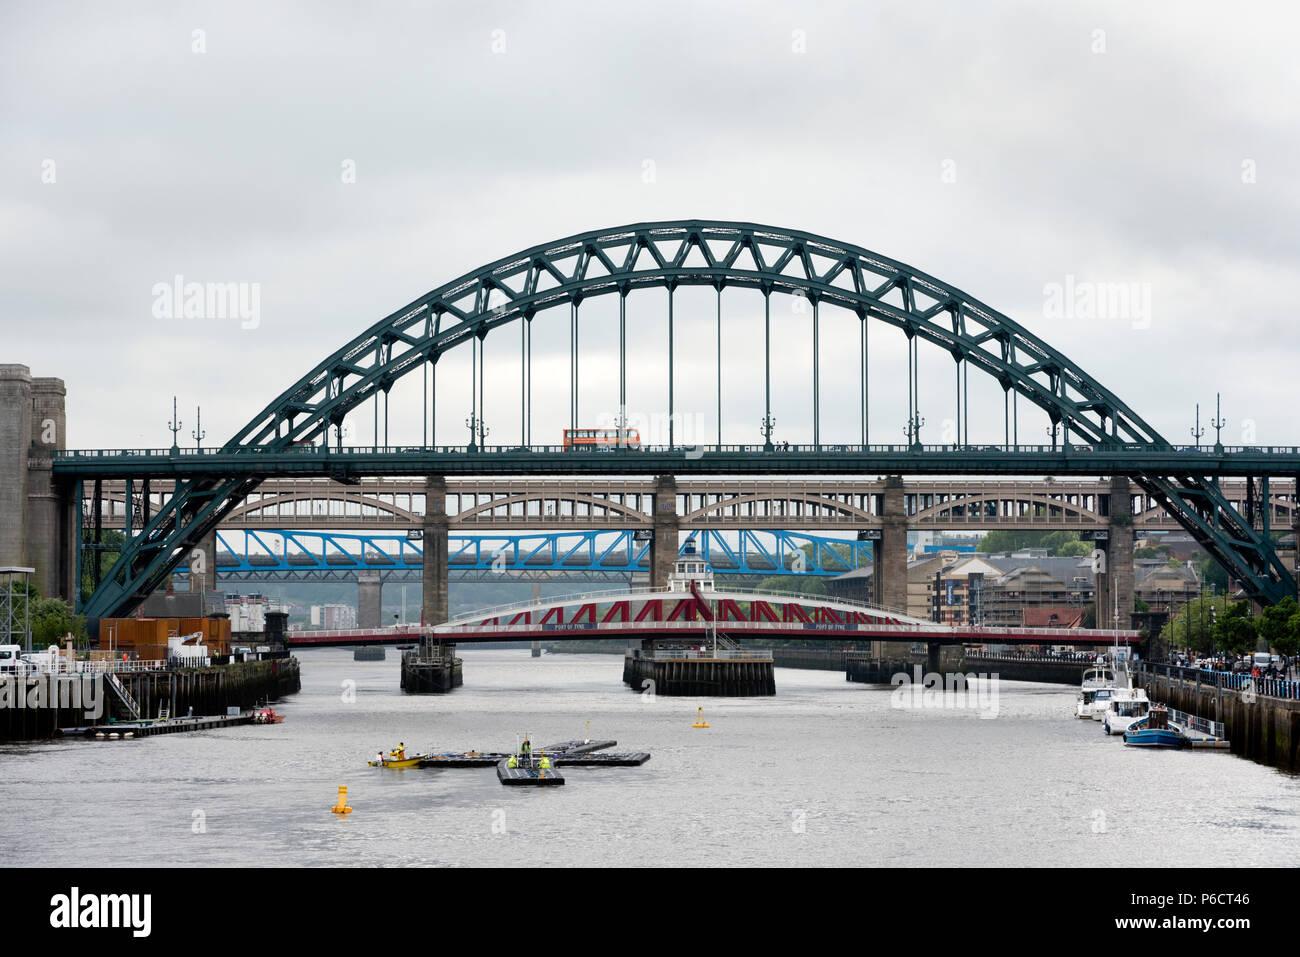 The River Tyne, showing The Tyne Bridge, The Swing Bridge and the High Level Bridge, Newcastle-upon-Tyne, UK - Stock Image